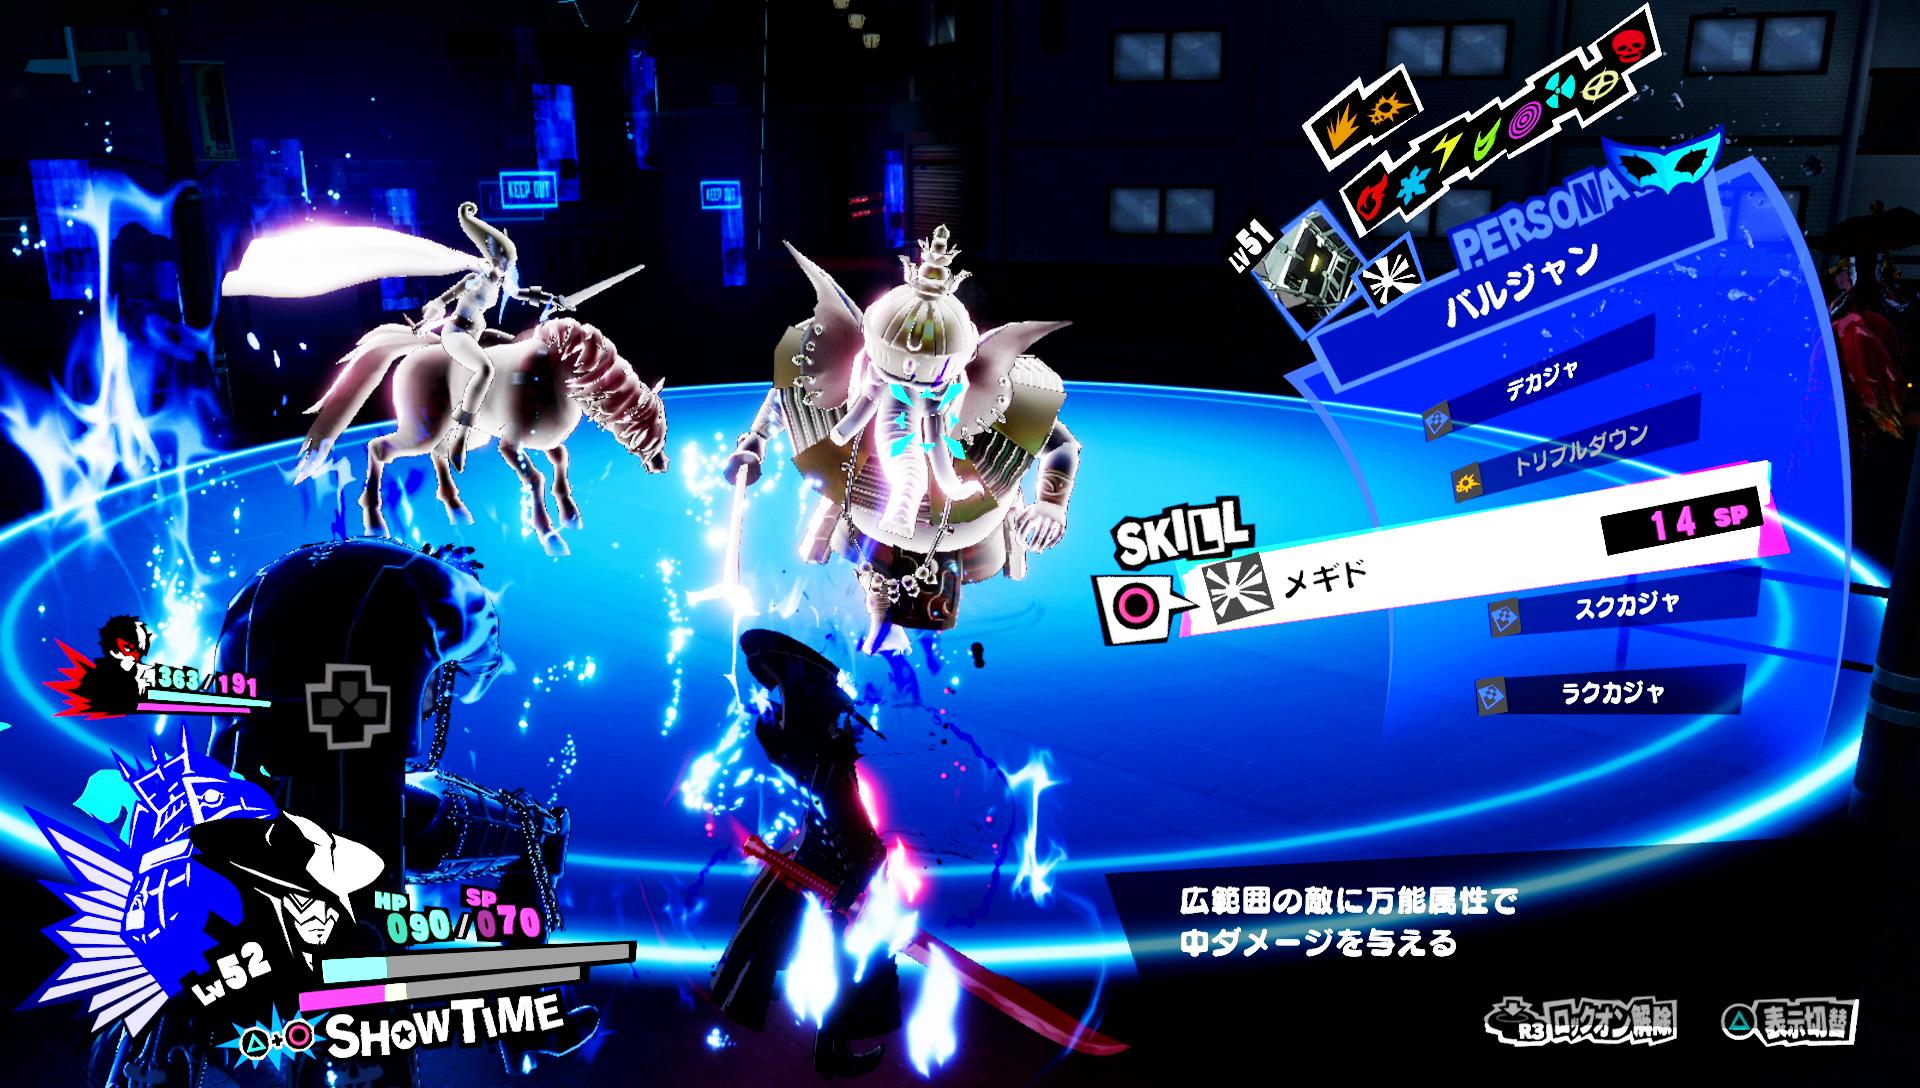 Persona 5 Scramble Zenkichi Hasegawa